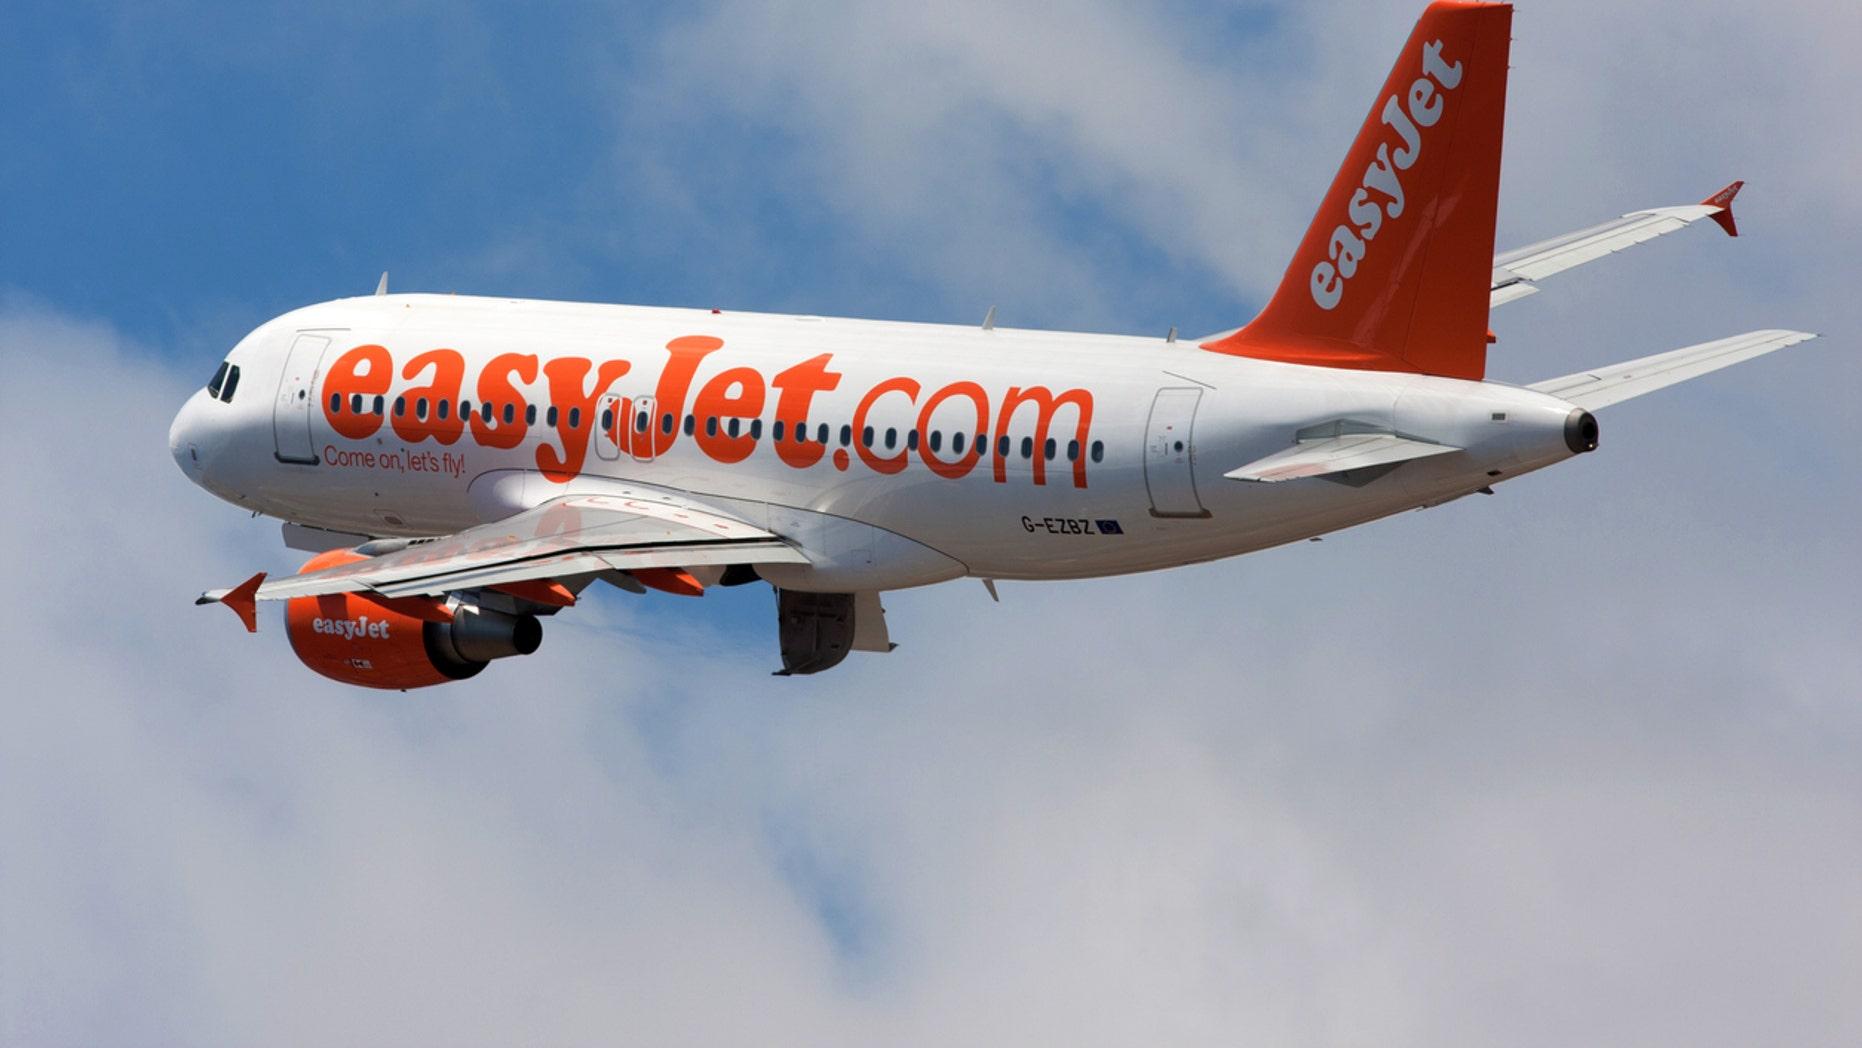 Easyjet Addresses Aerotoxic Syndrome By Adding New Cabin